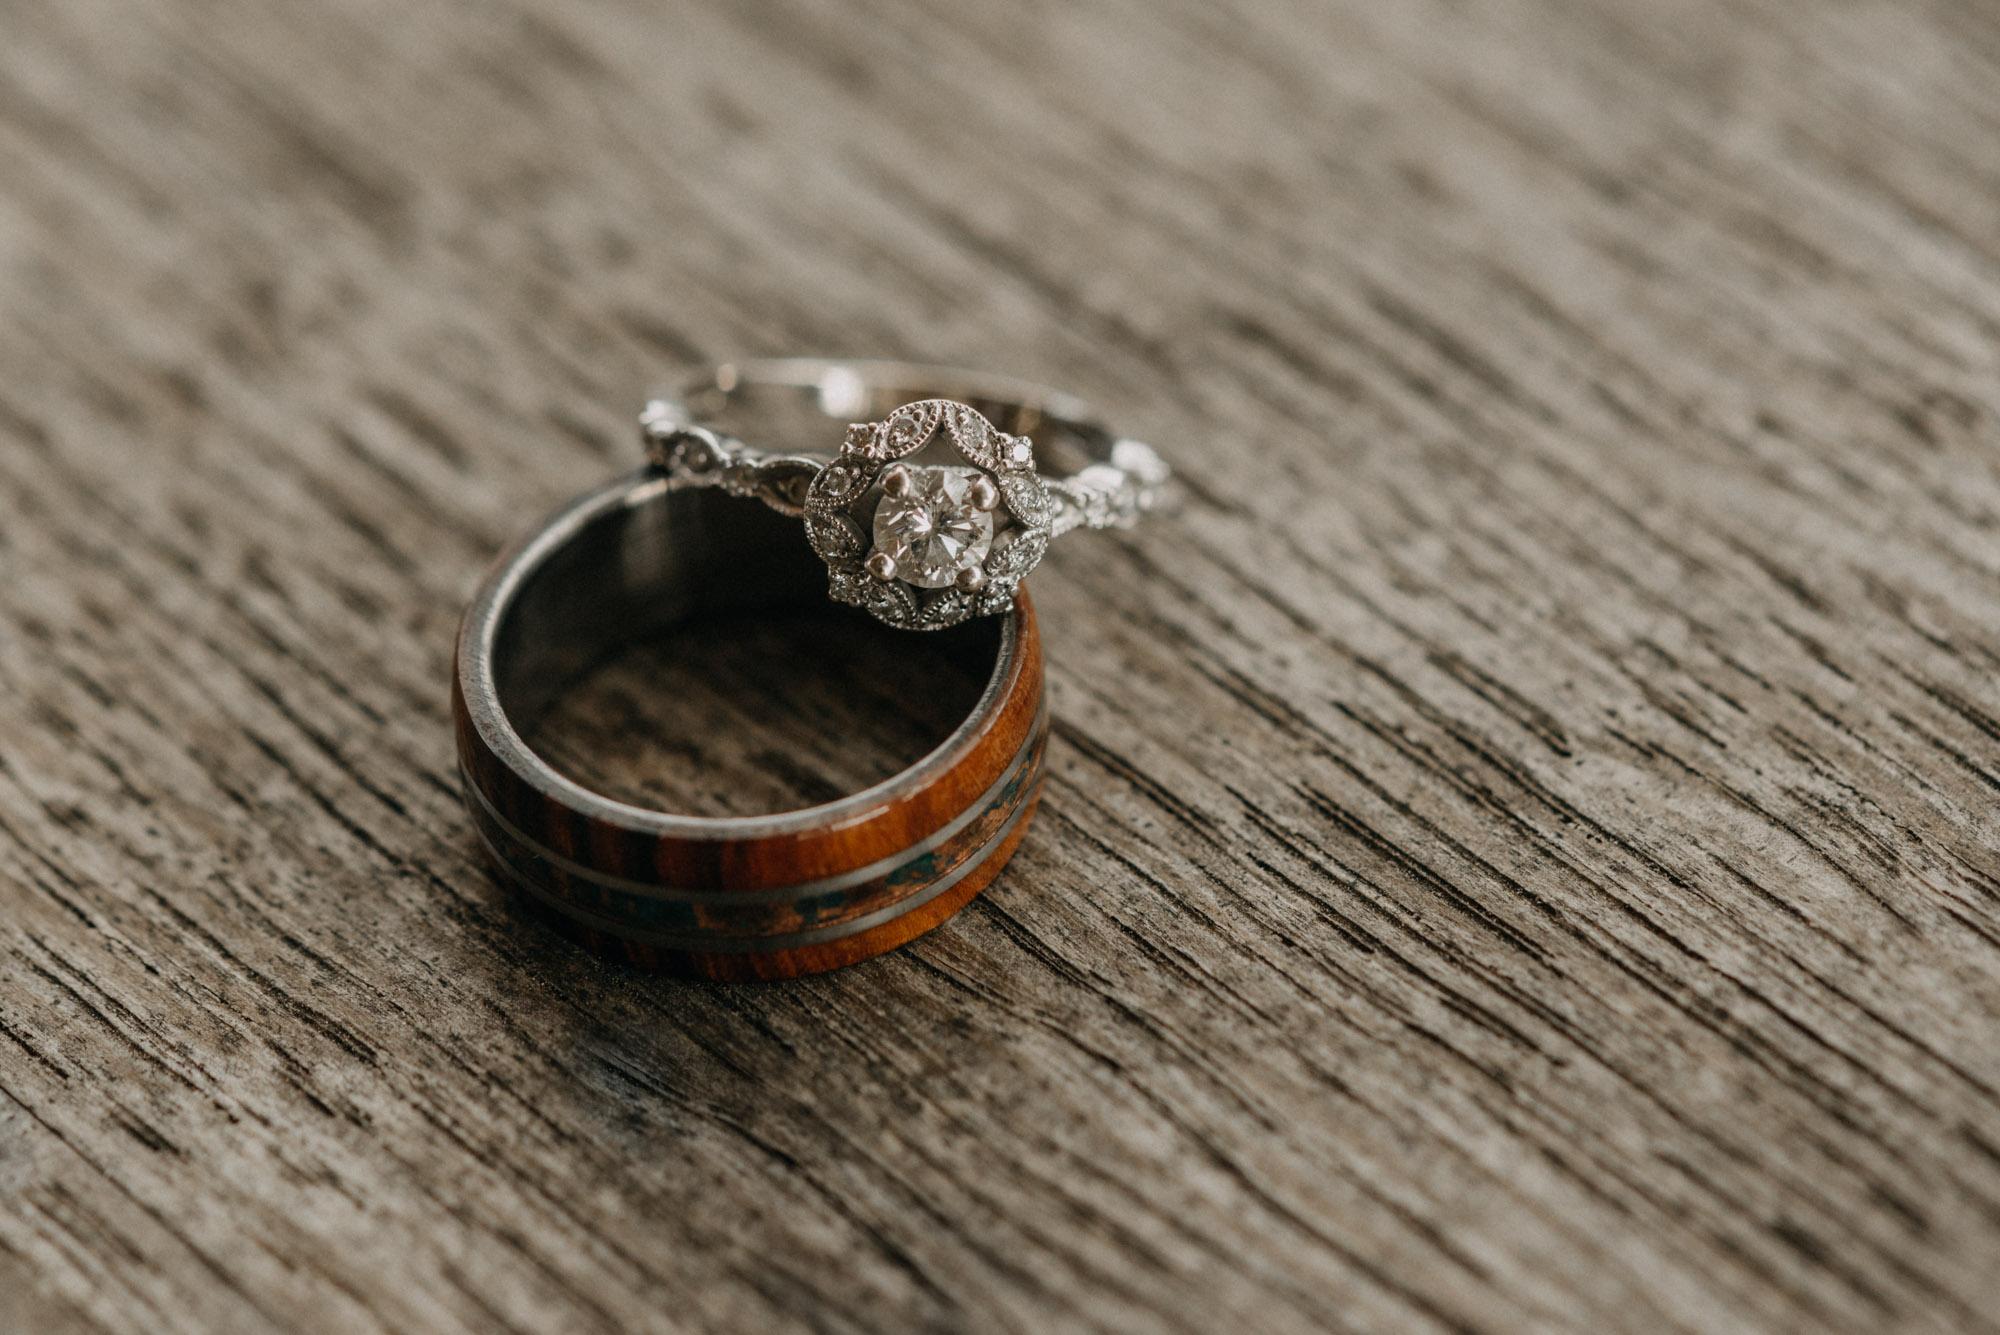 Getting-Ready-Swingset-Washington-Wedding-ringshot-7911.jpg